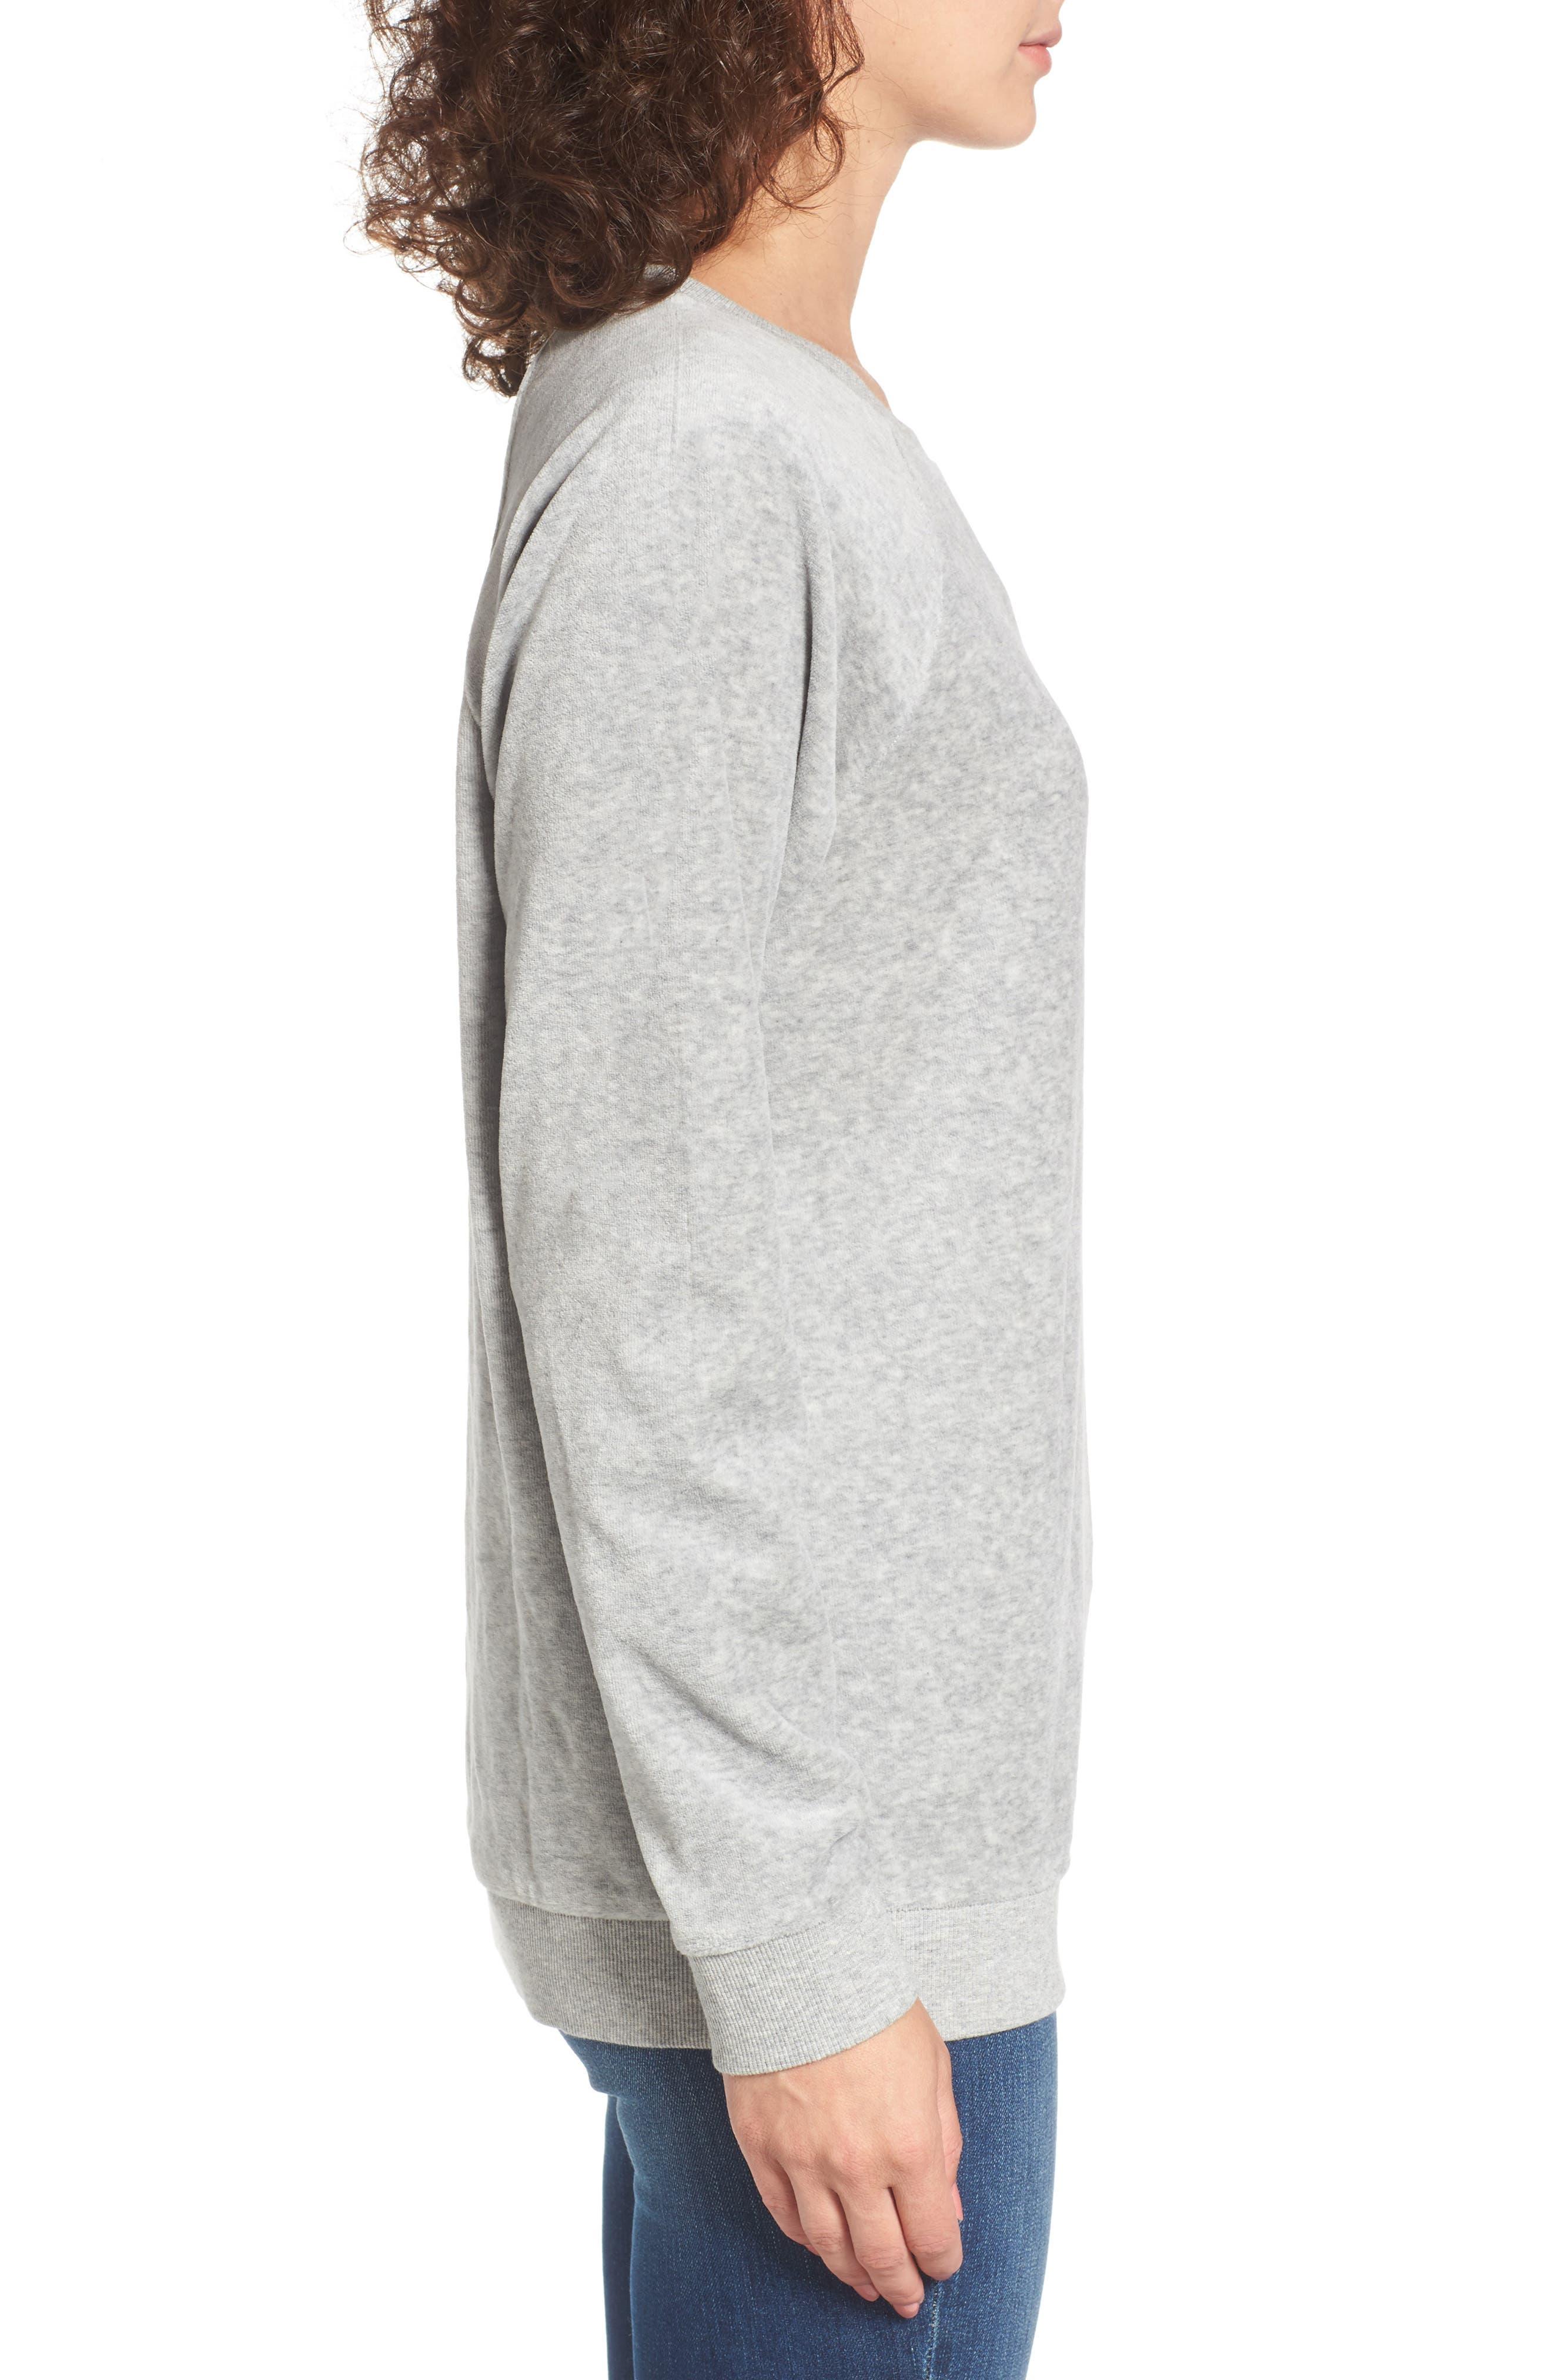 Gotta Crush Raglan Sweatshirt,                             Alternate thumbnail 3, color,                             035